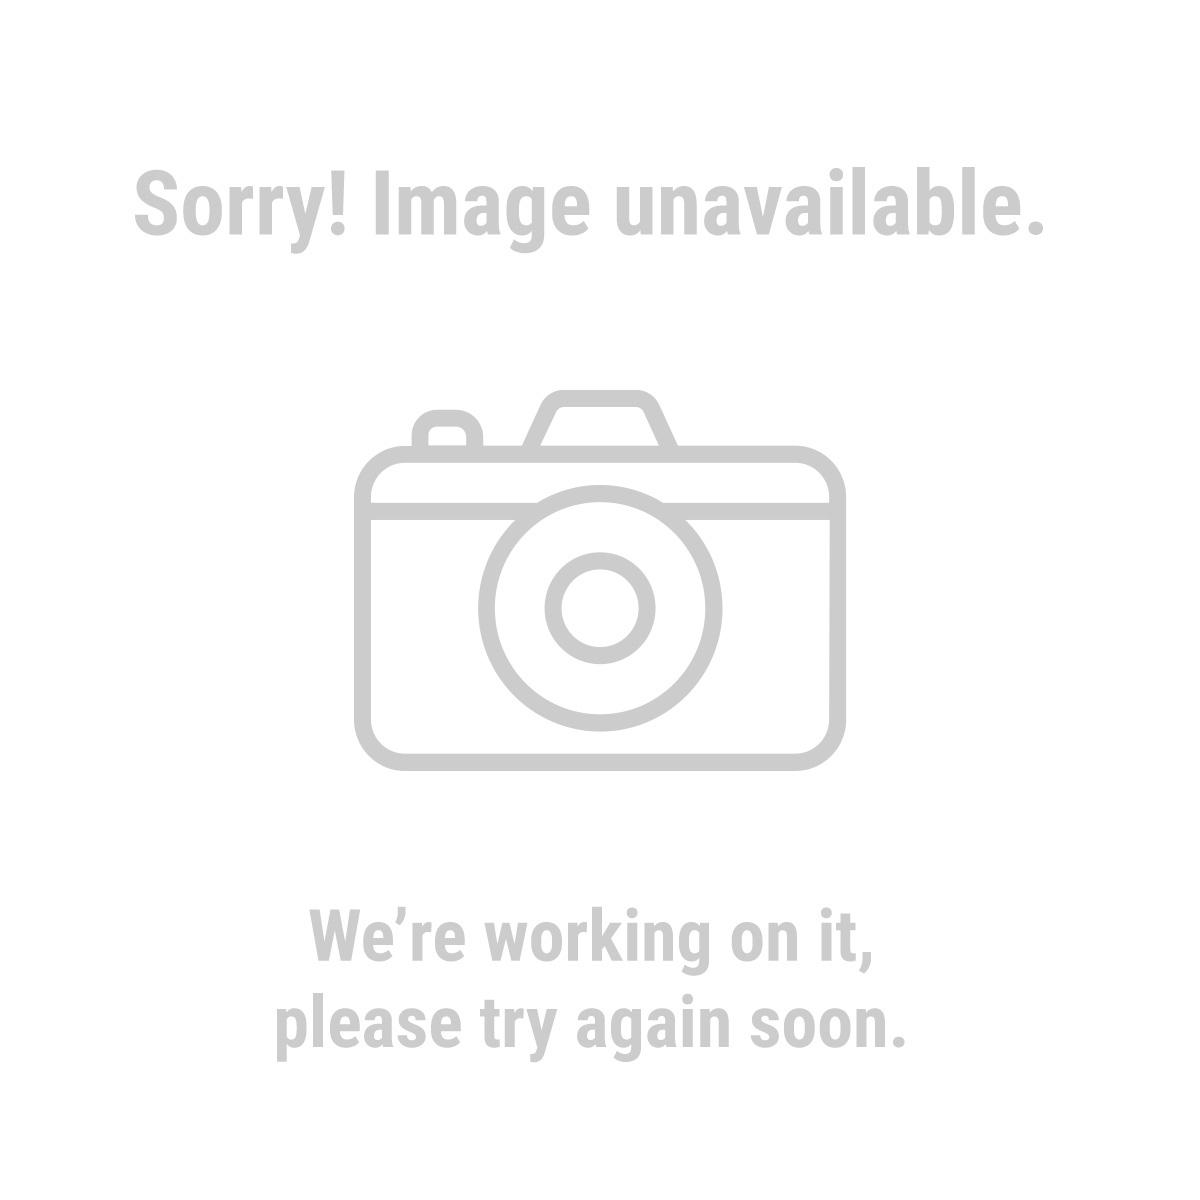 Warrior® 69974 5 Piece 4'' x 24'', 80 Grit Sanding Belts